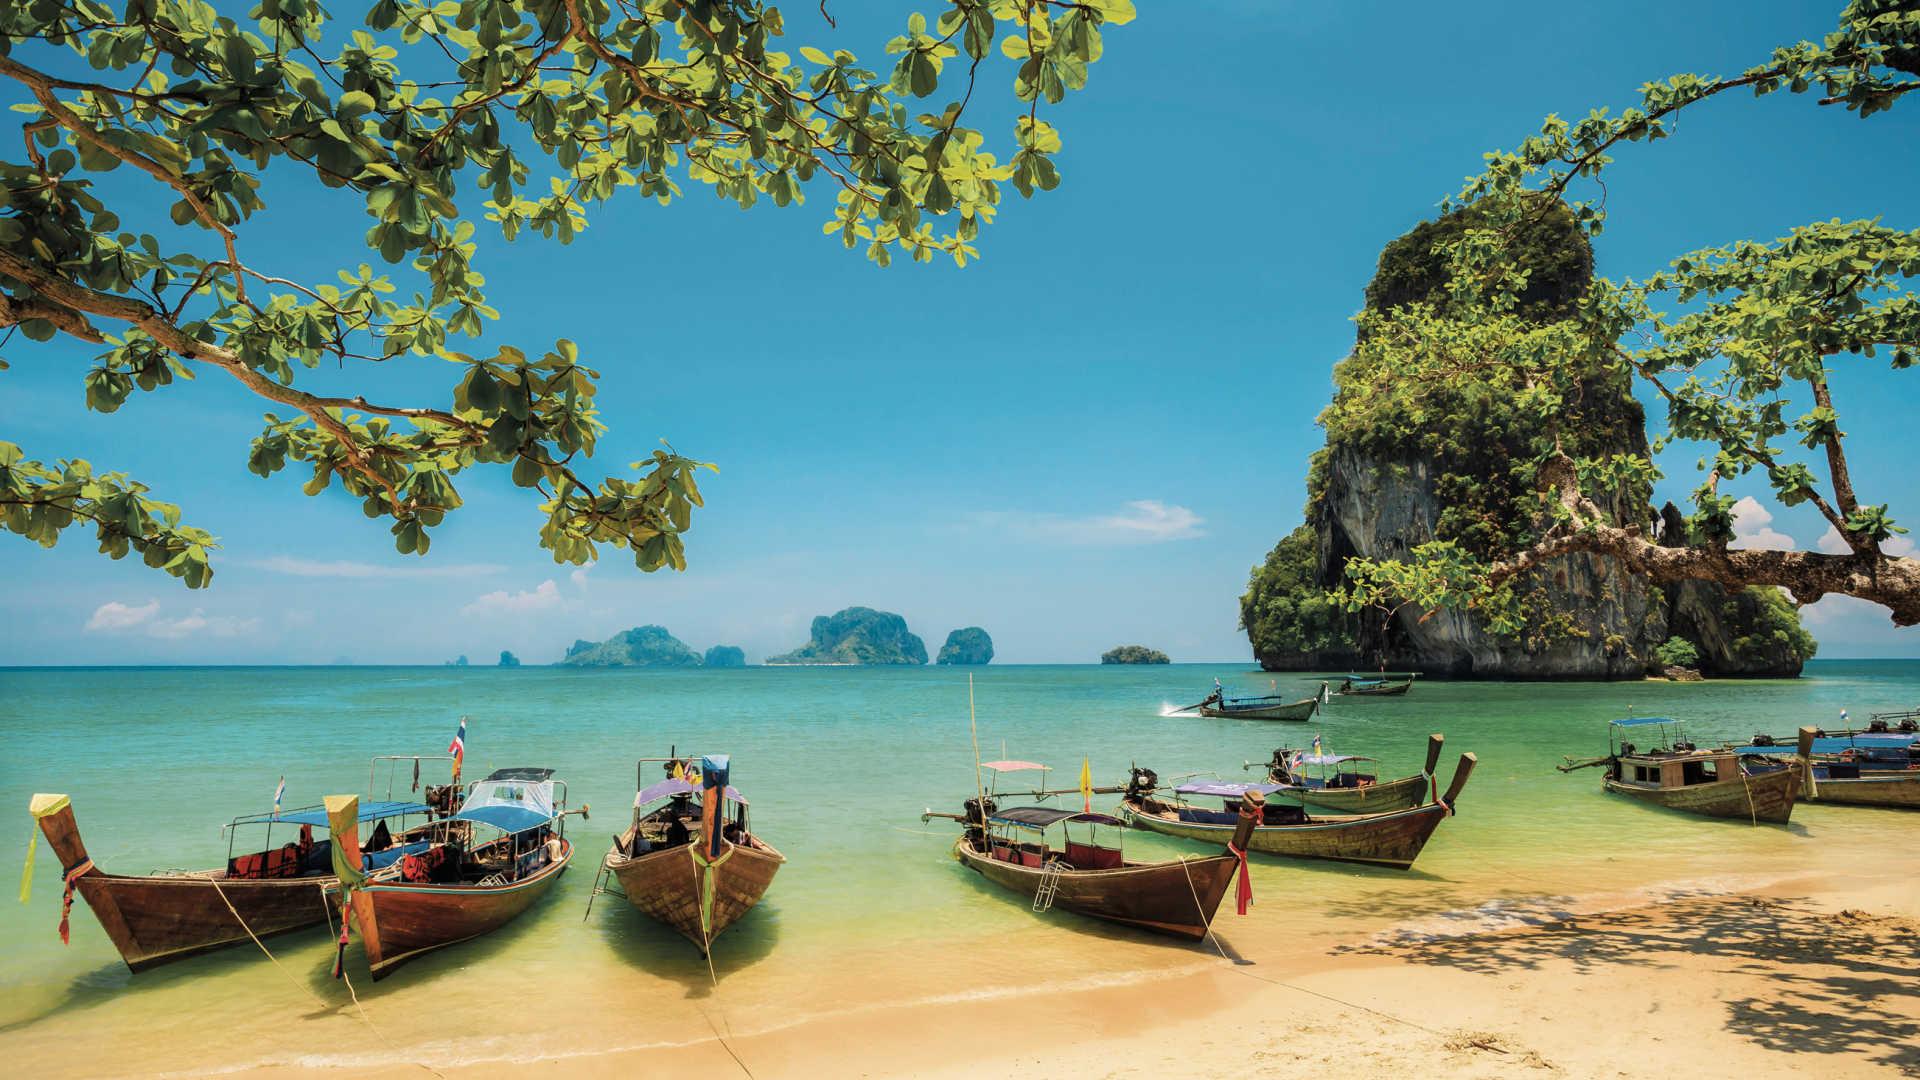 Astute Aviation | Thailand | Winter Sun | Private Jet Charter | Private Jet Hire | Luxury Travel | Jet Sharper